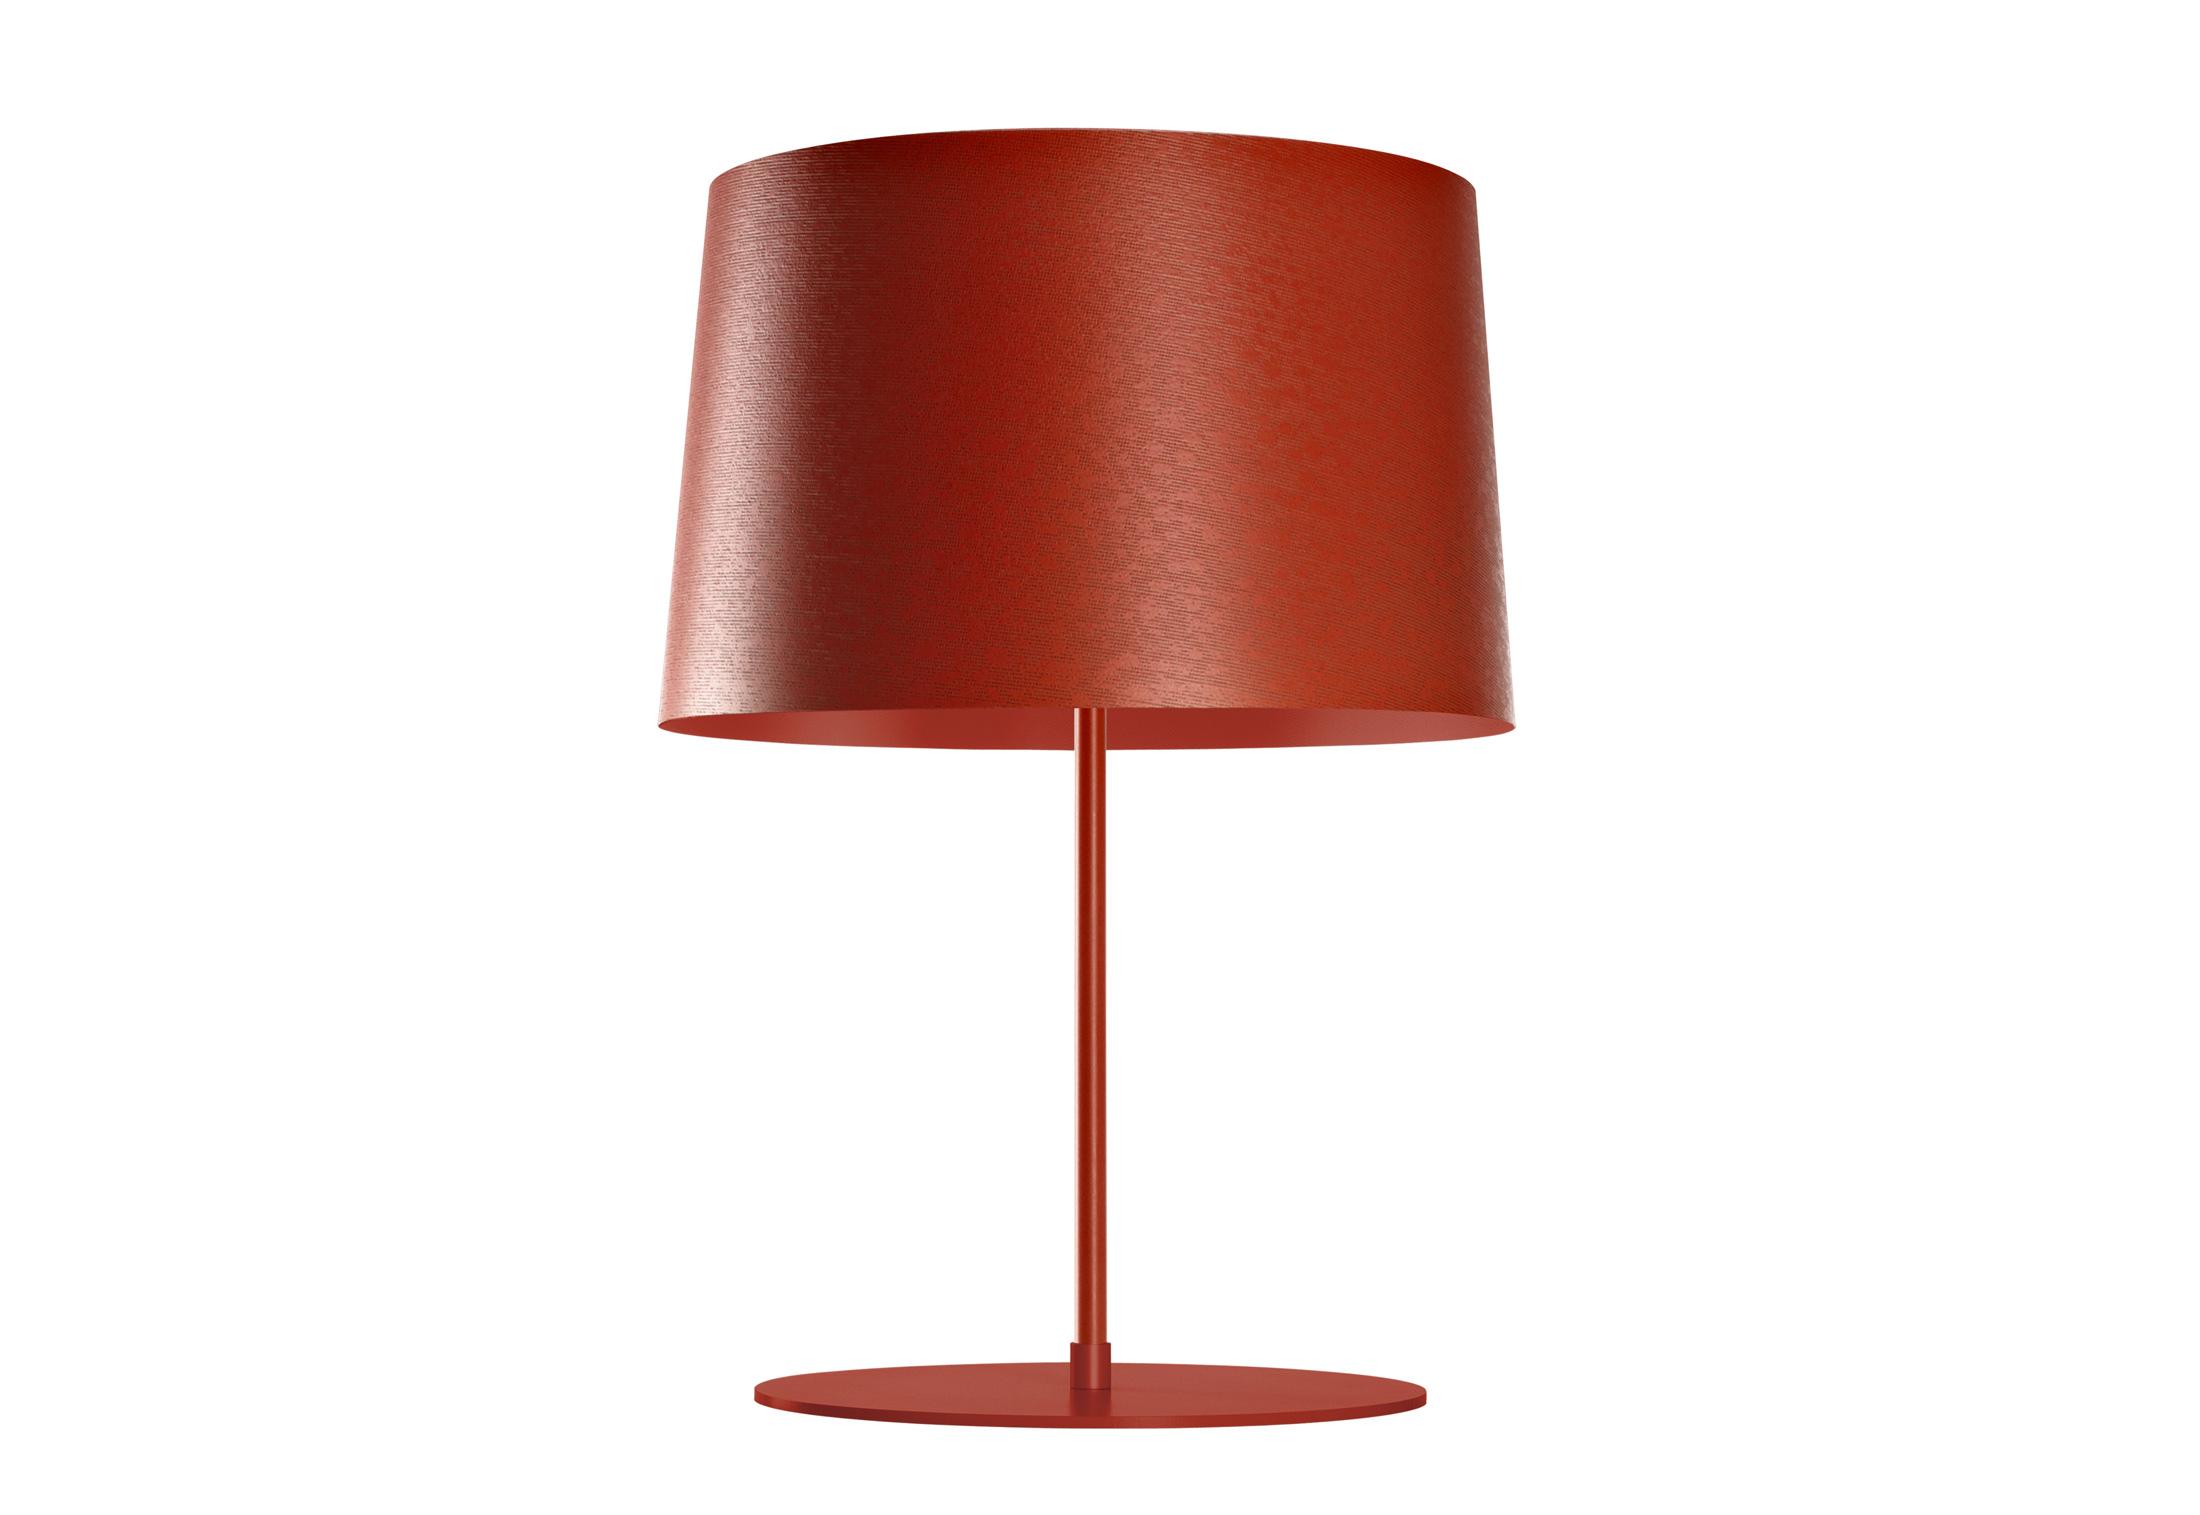 Twiggy Table Lamp XL By Foscarini